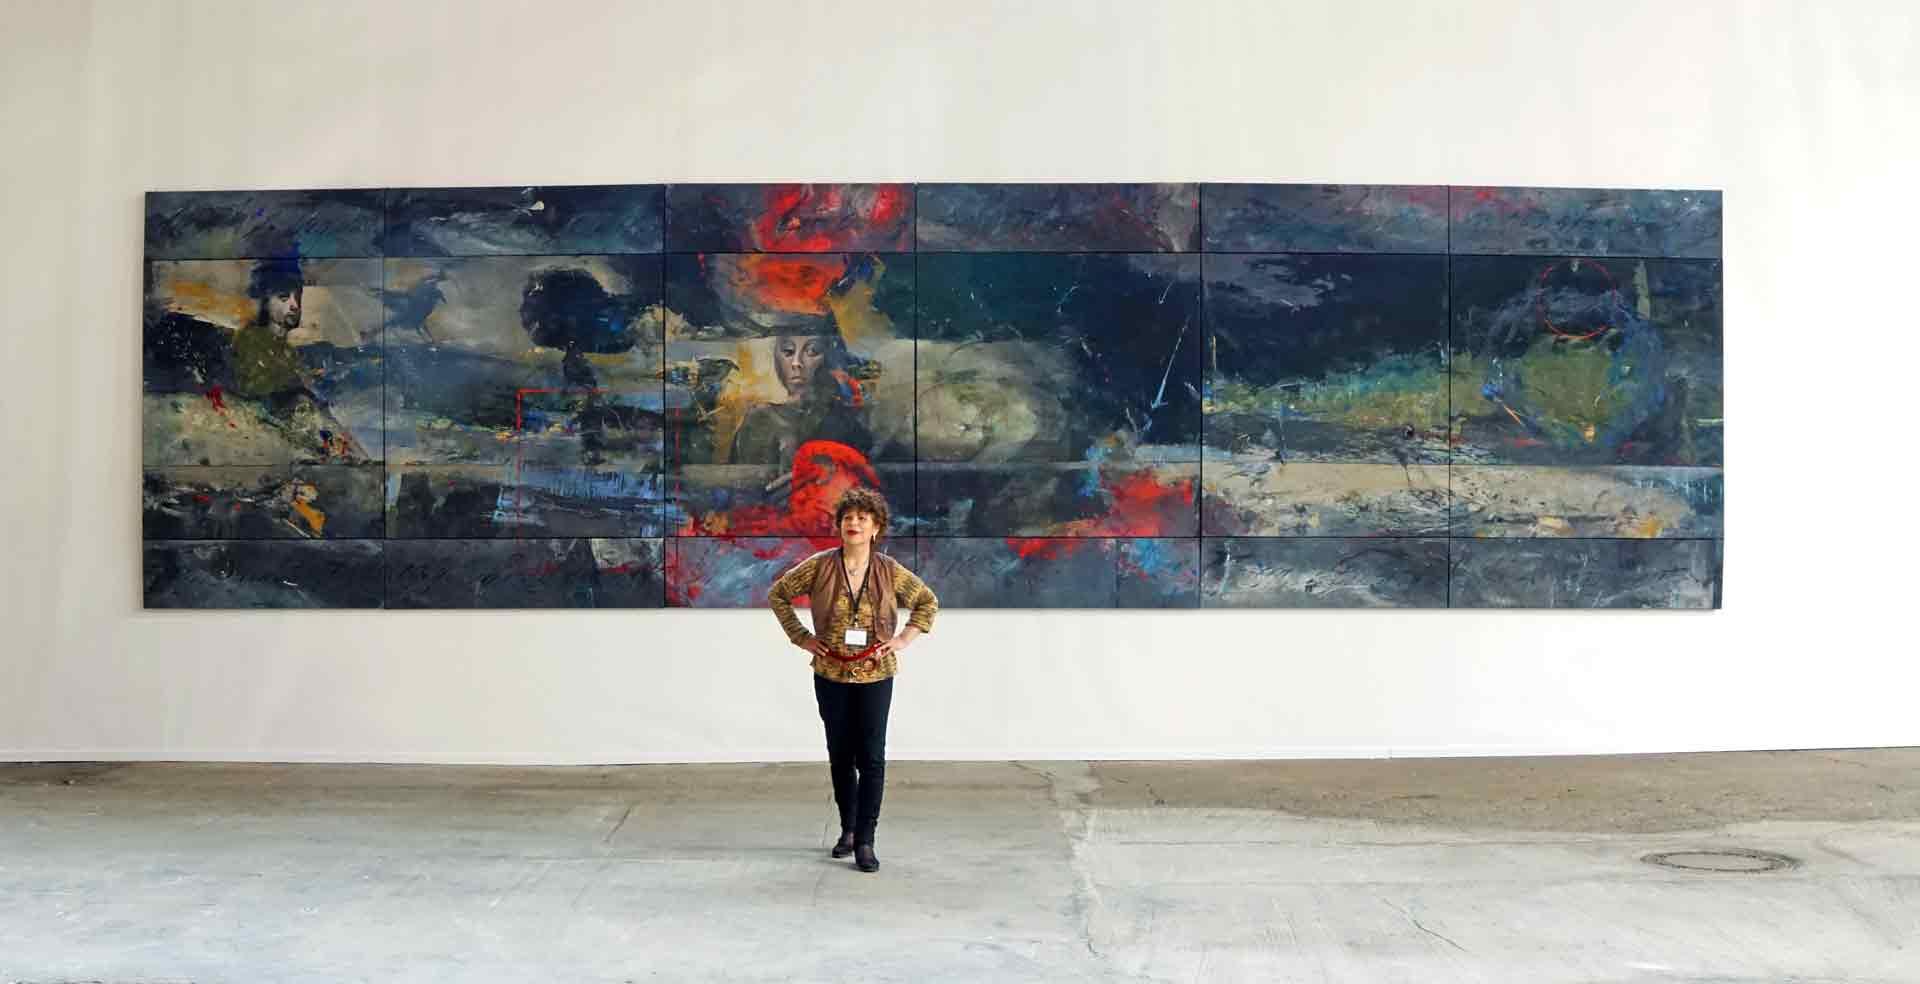 Dalva Duarte - Artist - The Queen of Chaos - Nordart - Exhibition in Germany - Exposition en Allemagne